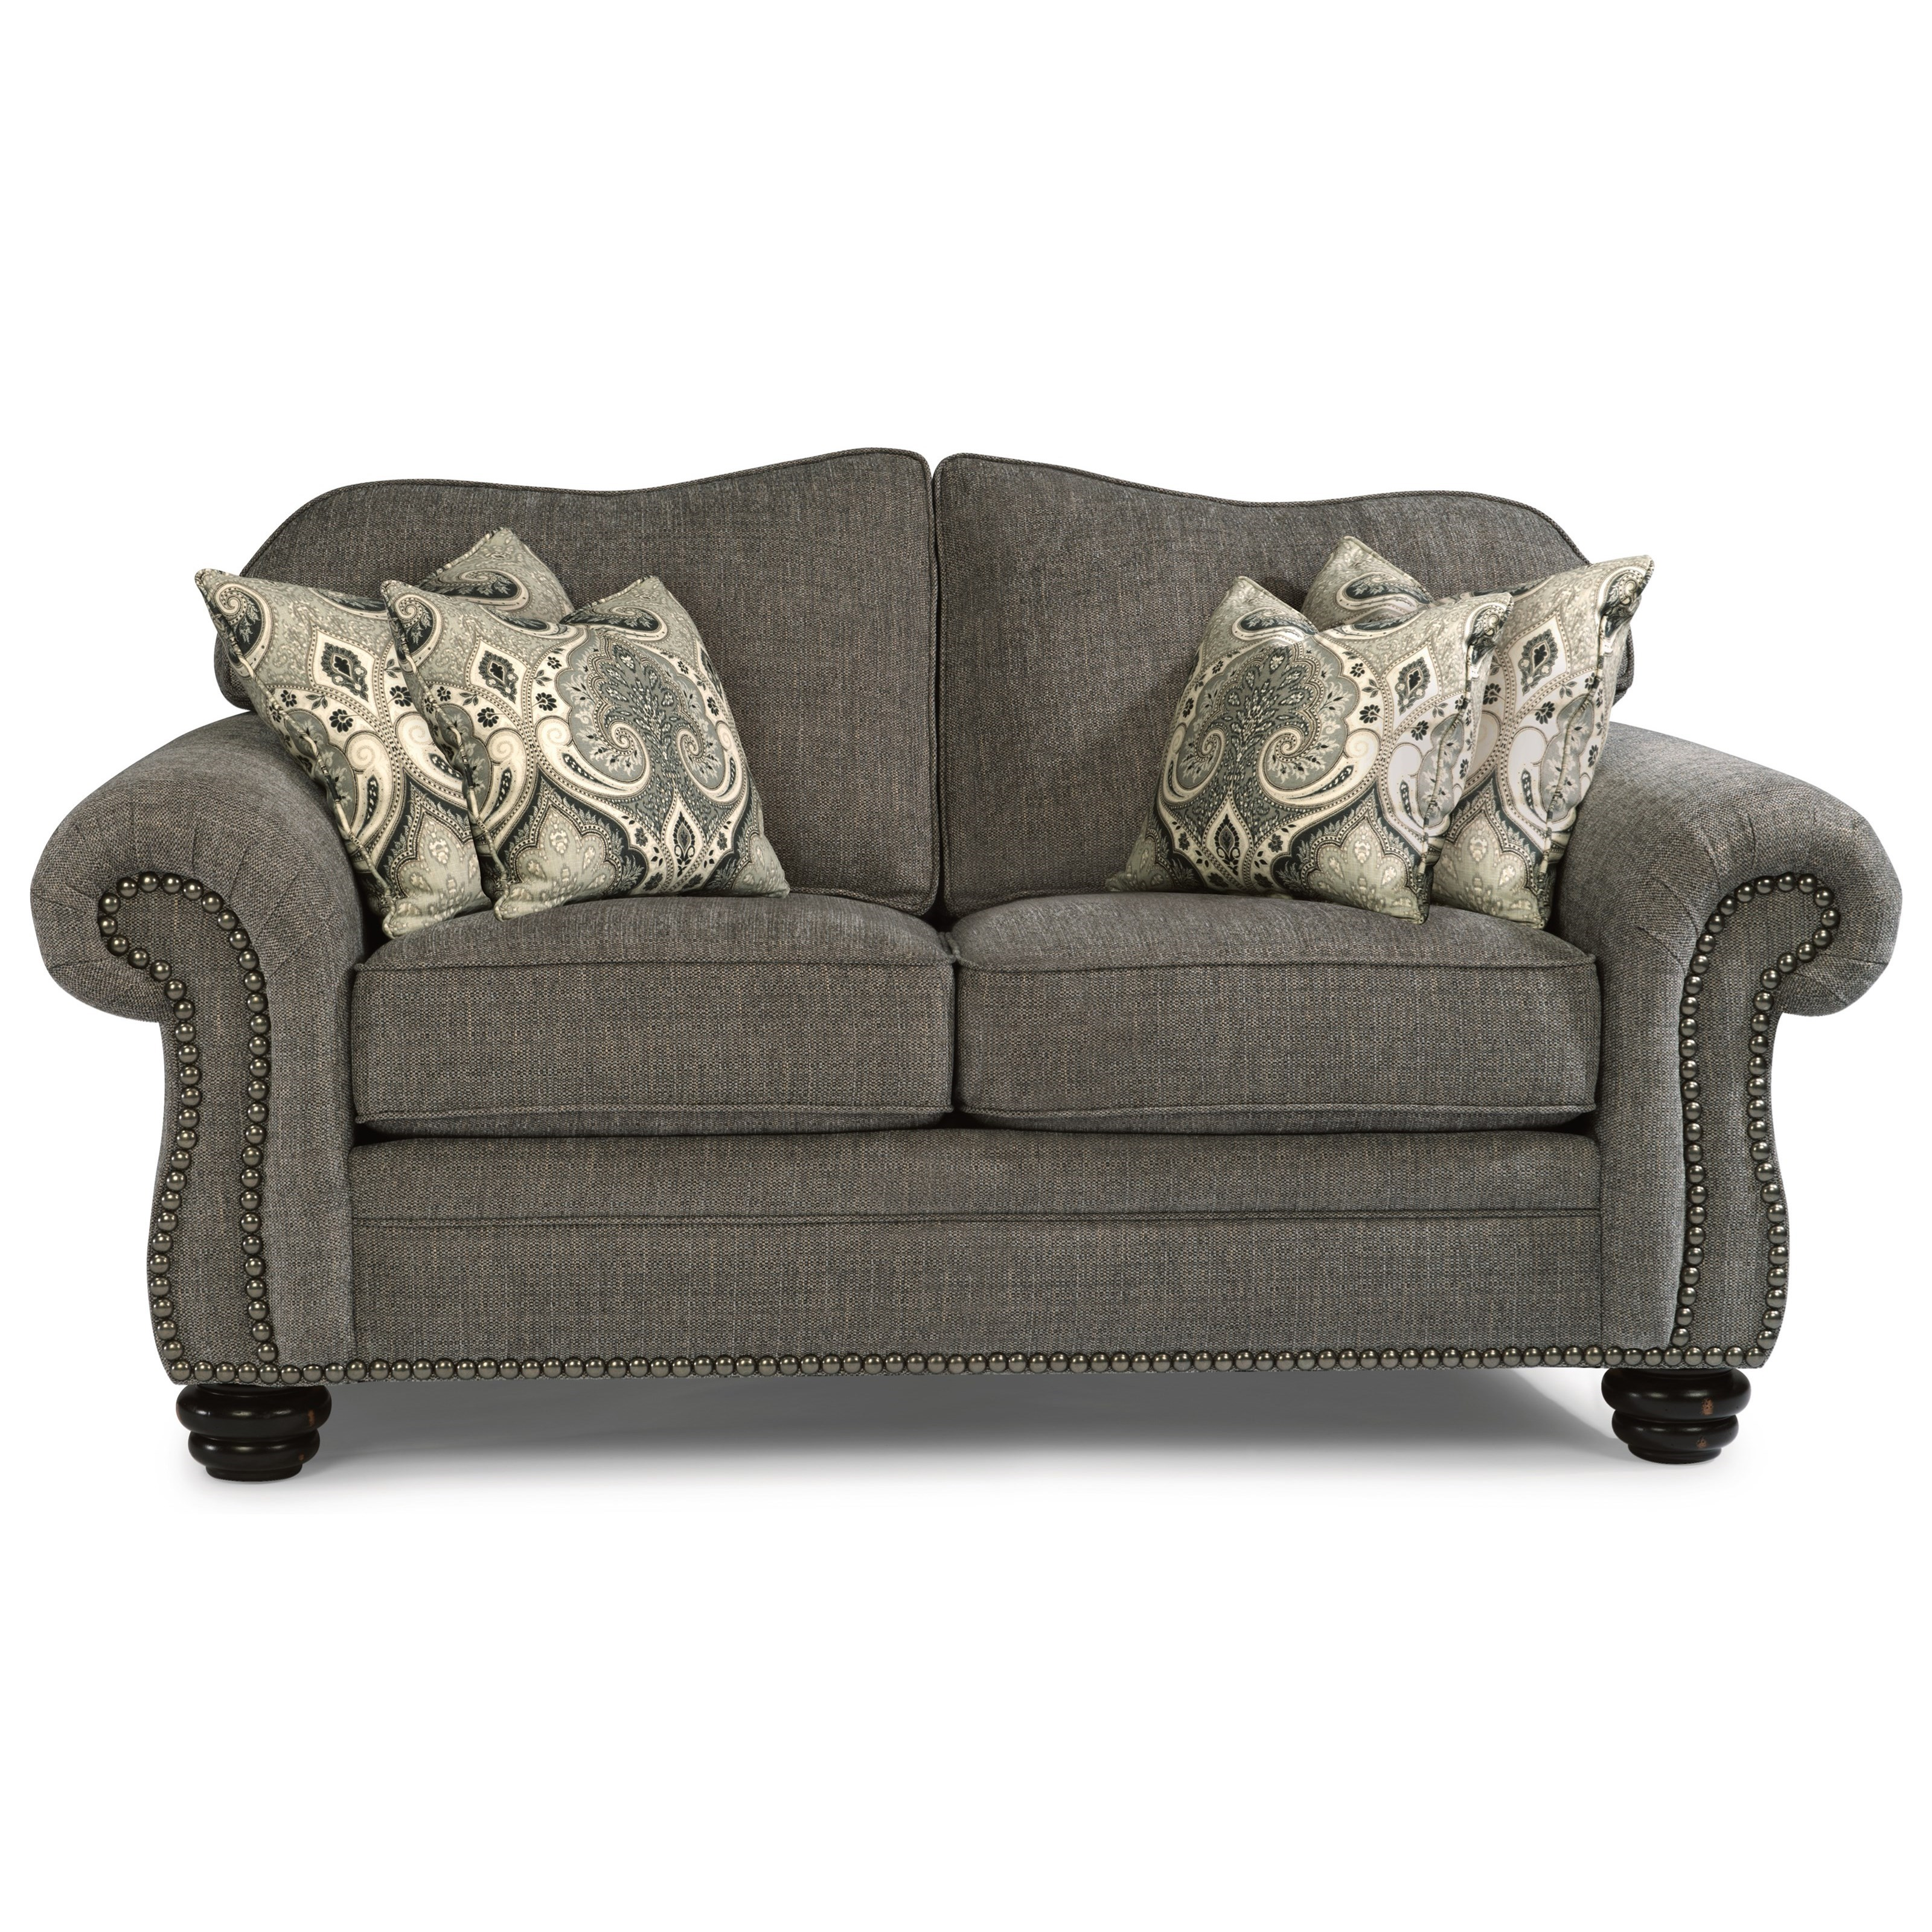 Wymore Loveseat by Flexsteel at Crowley Furniture & Mattress